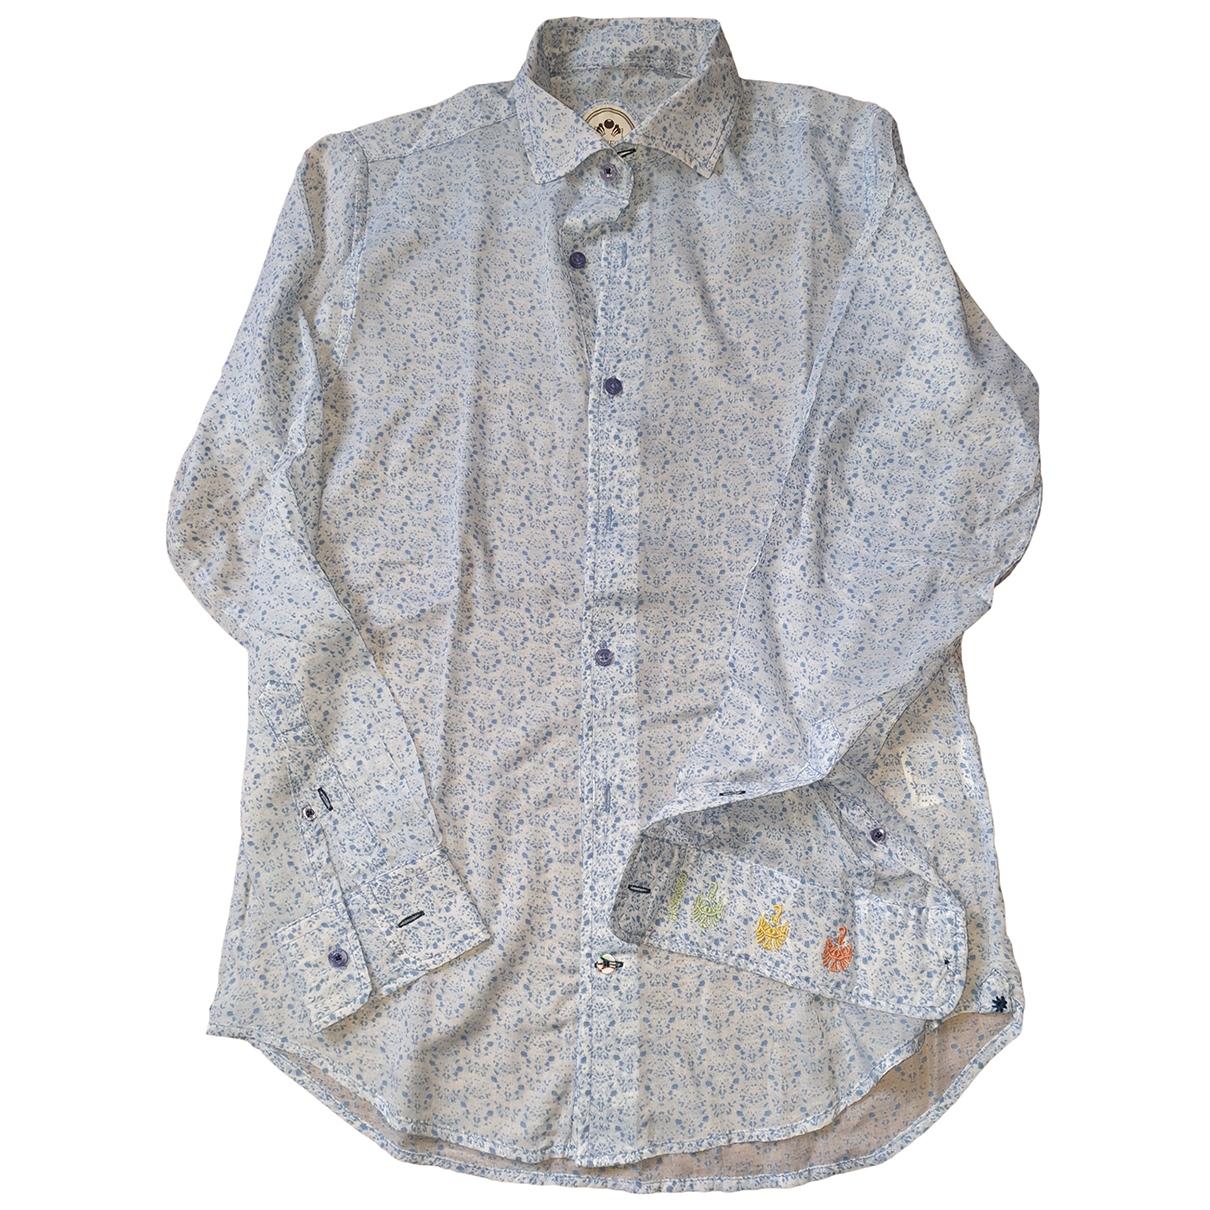 Non Signé / Unsigned \N Cotton Shirts for Men 39 EU (tour de cou / collar)